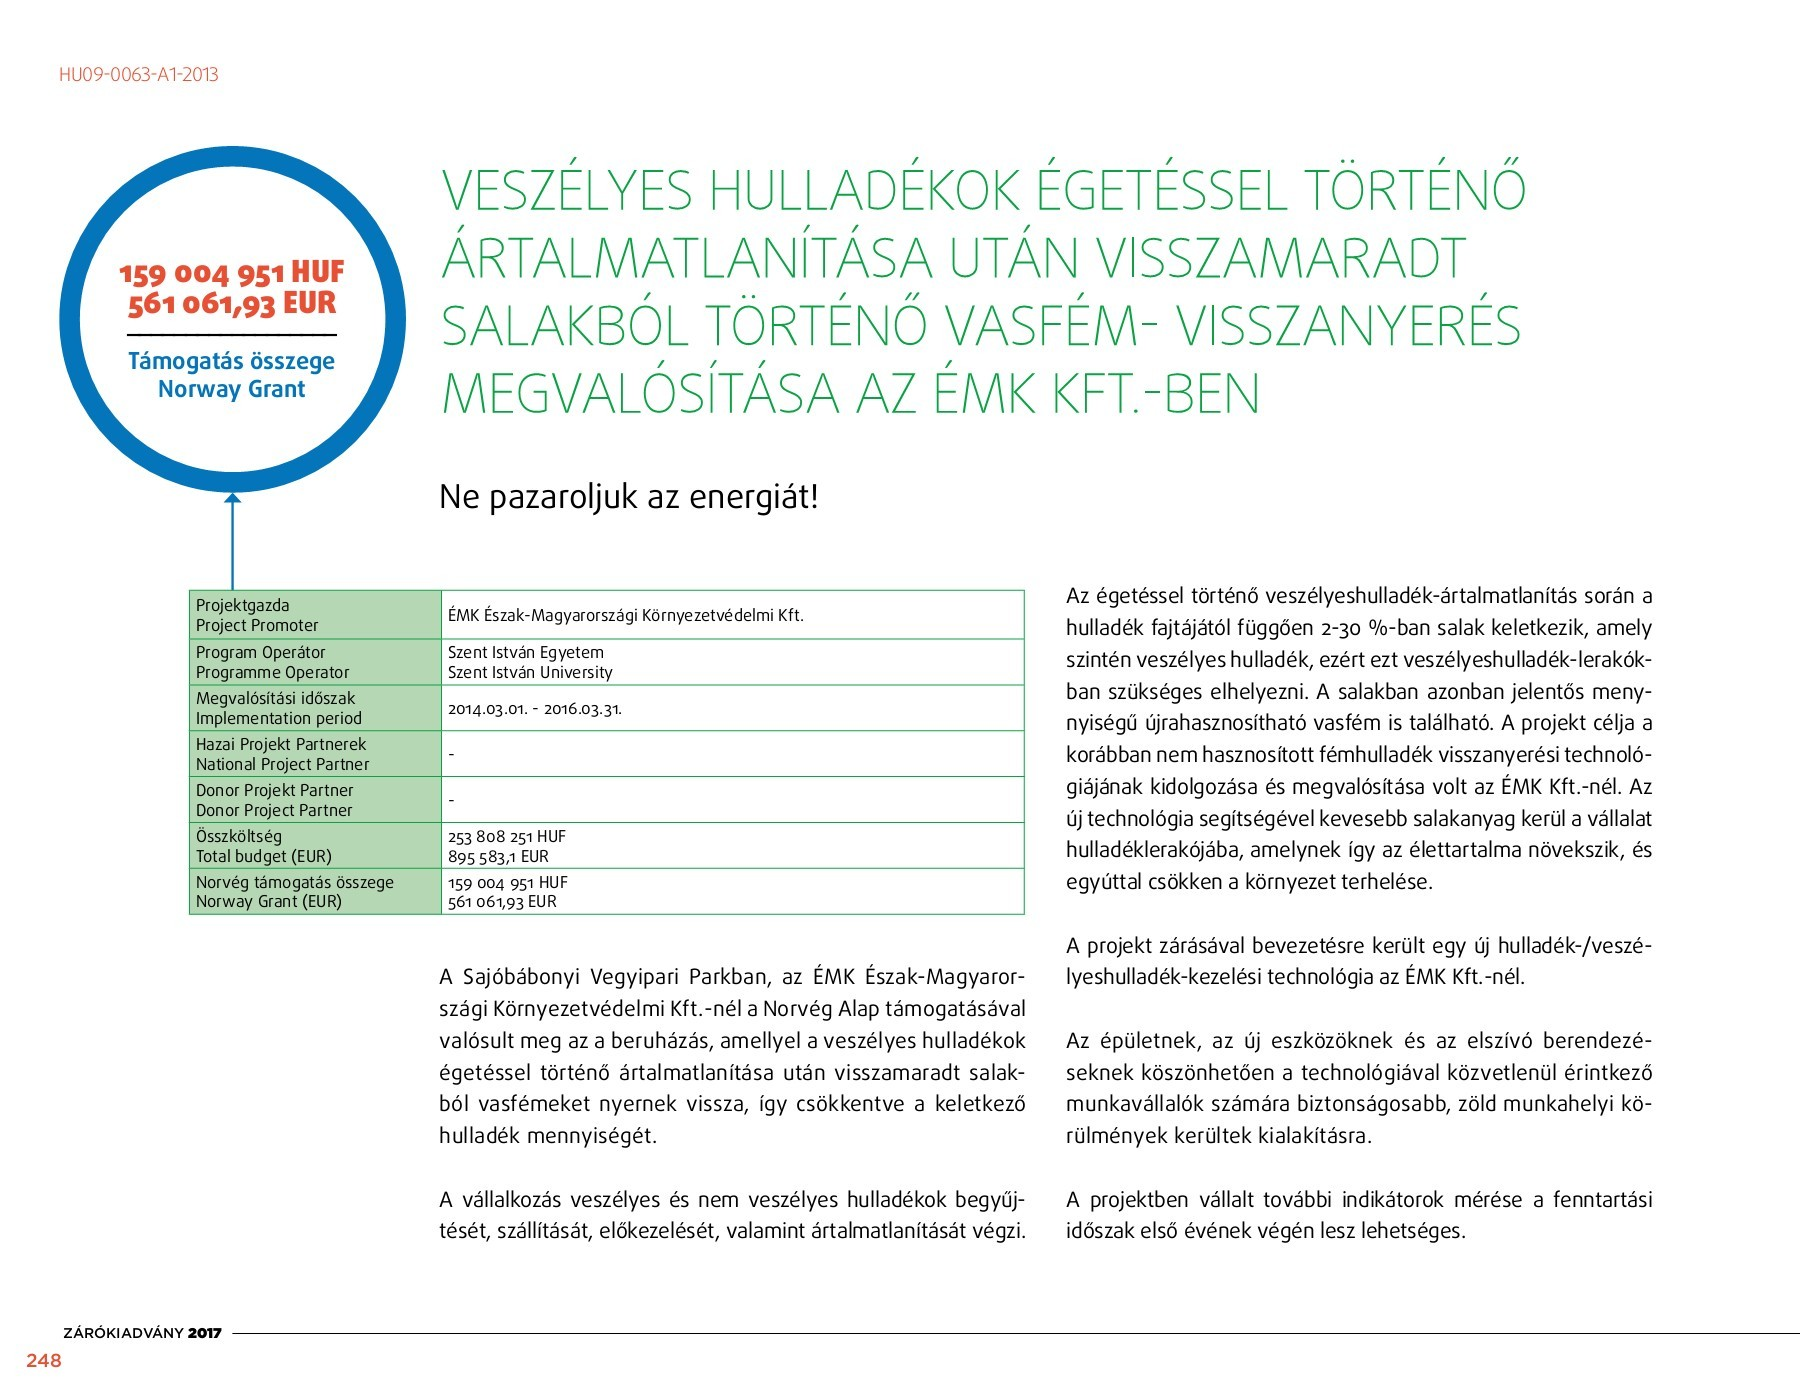 papilloma vakcina vírus emilia romagna hpv vakcina 26 év feletti felnőtteknek